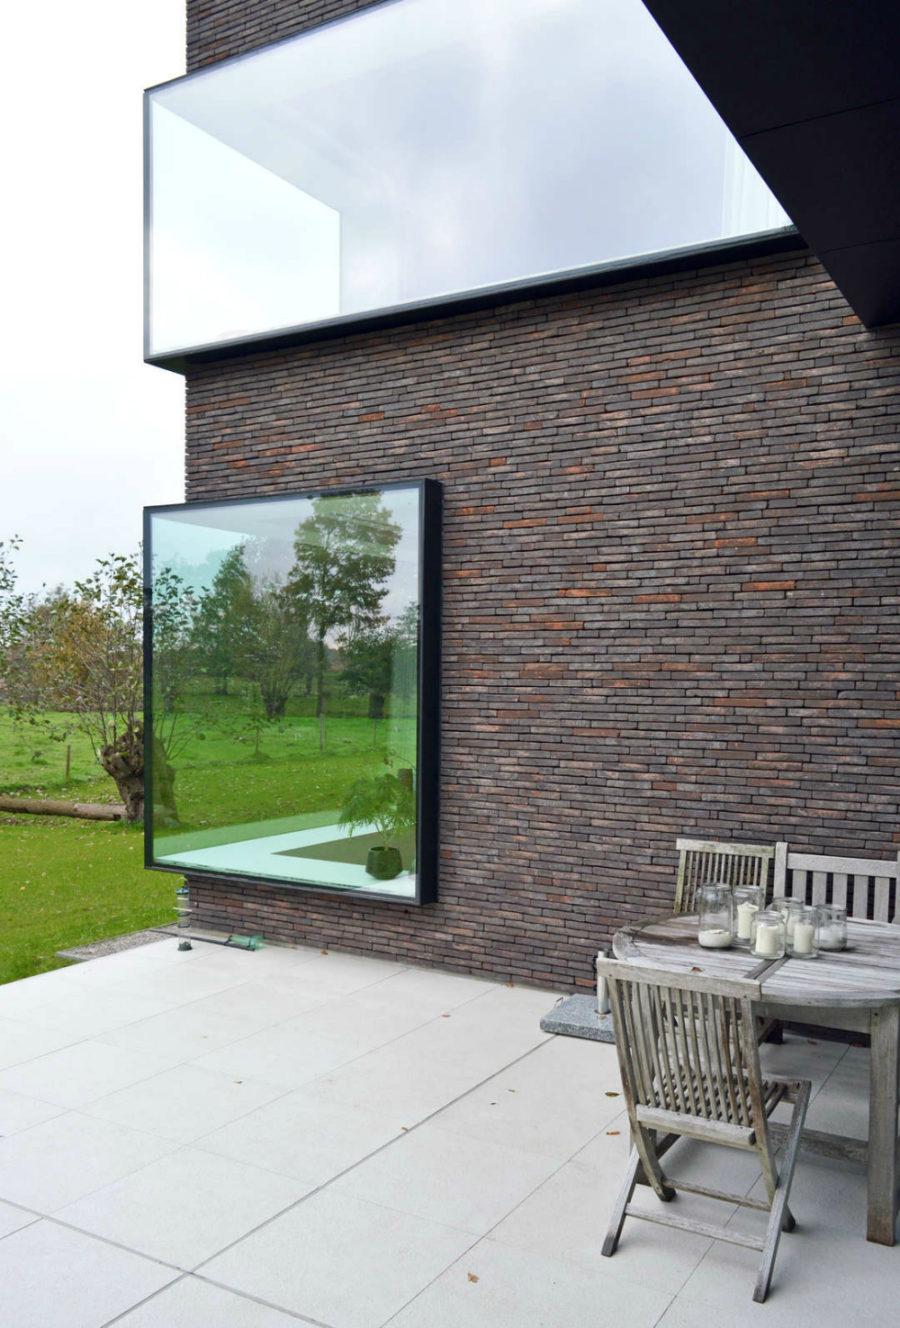 F&C Kiekens by Architektuurburo Dirk Hulpia